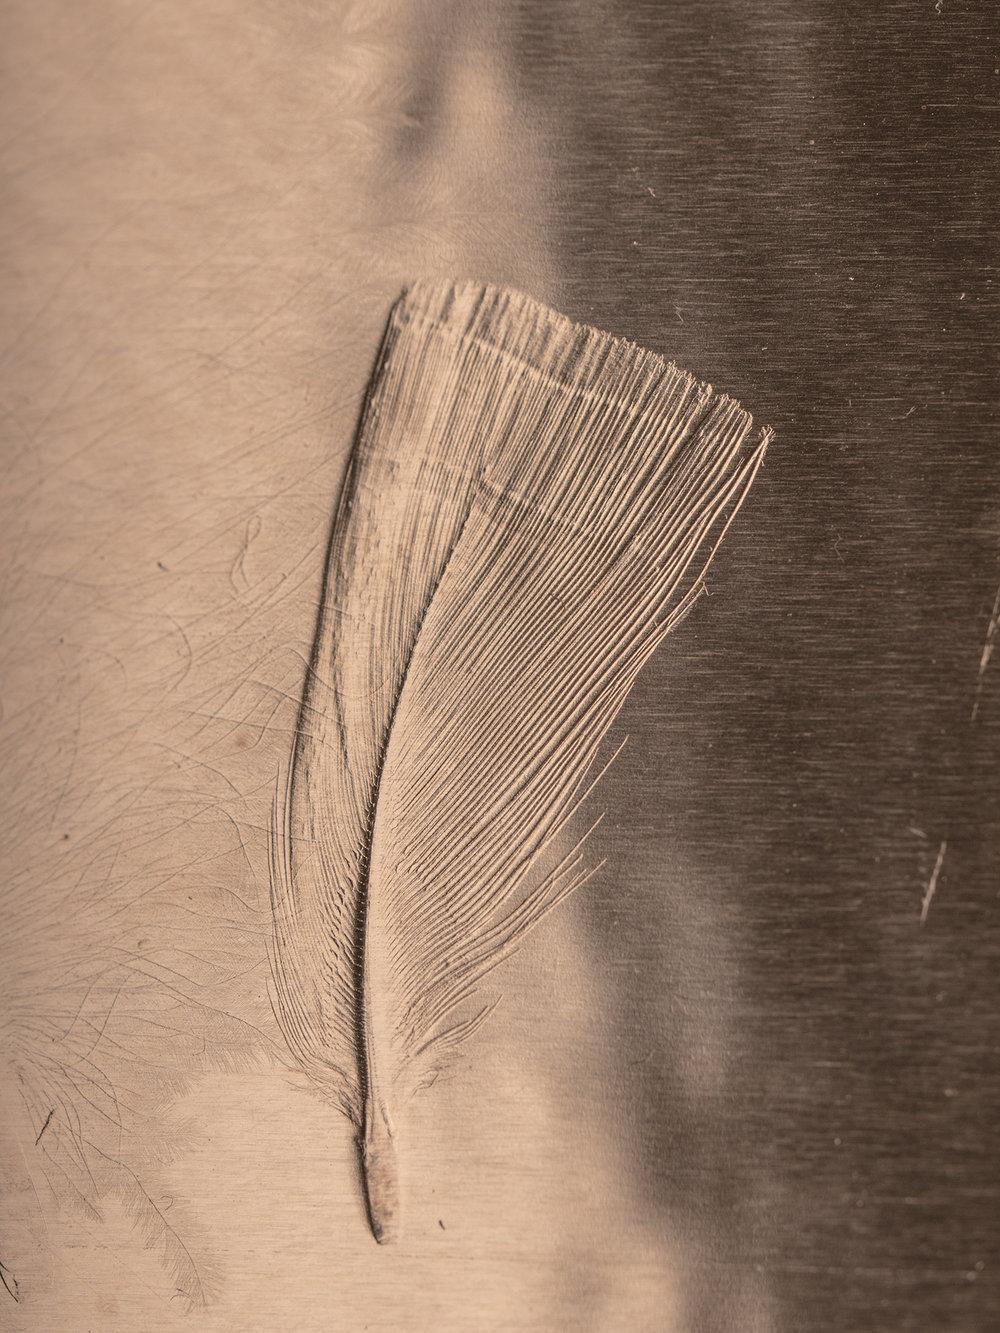 Christina-Pauls-Feder-Kupfer-Federbild-Detail.jpg